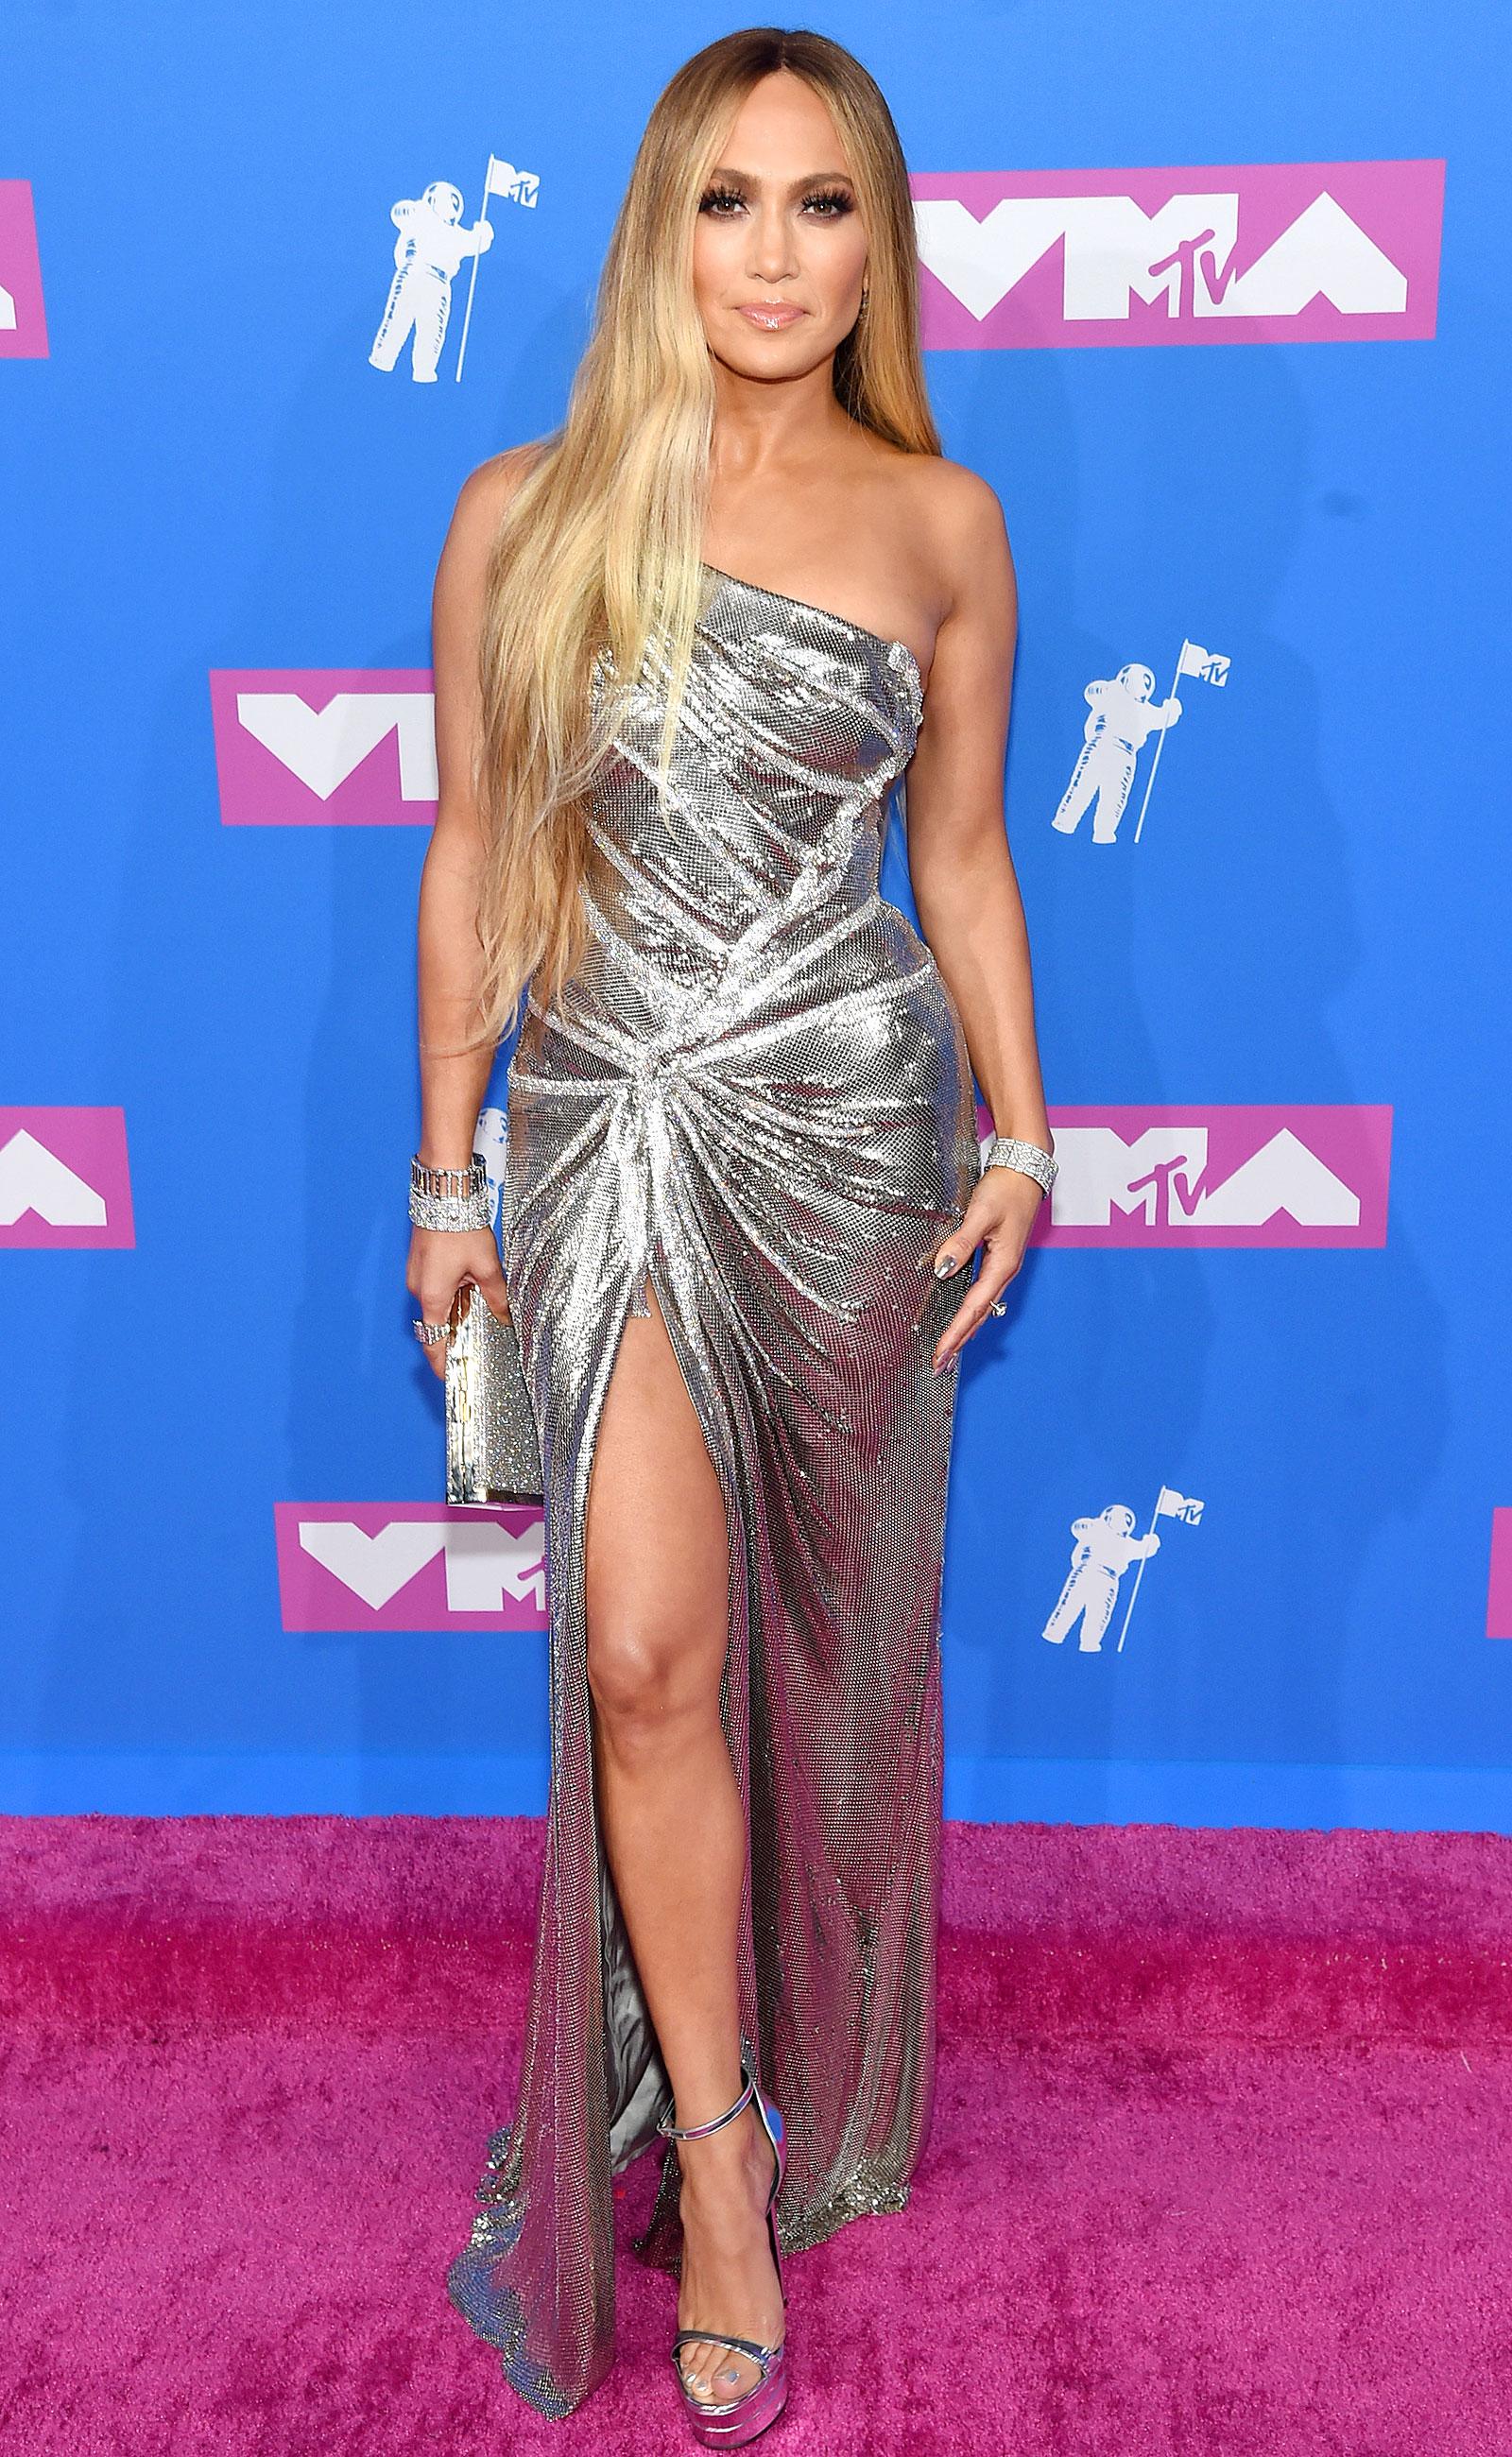 Jennifer Mode Lopez Goddess'' Au En Vma's Lozzoo ''silver thQdsr